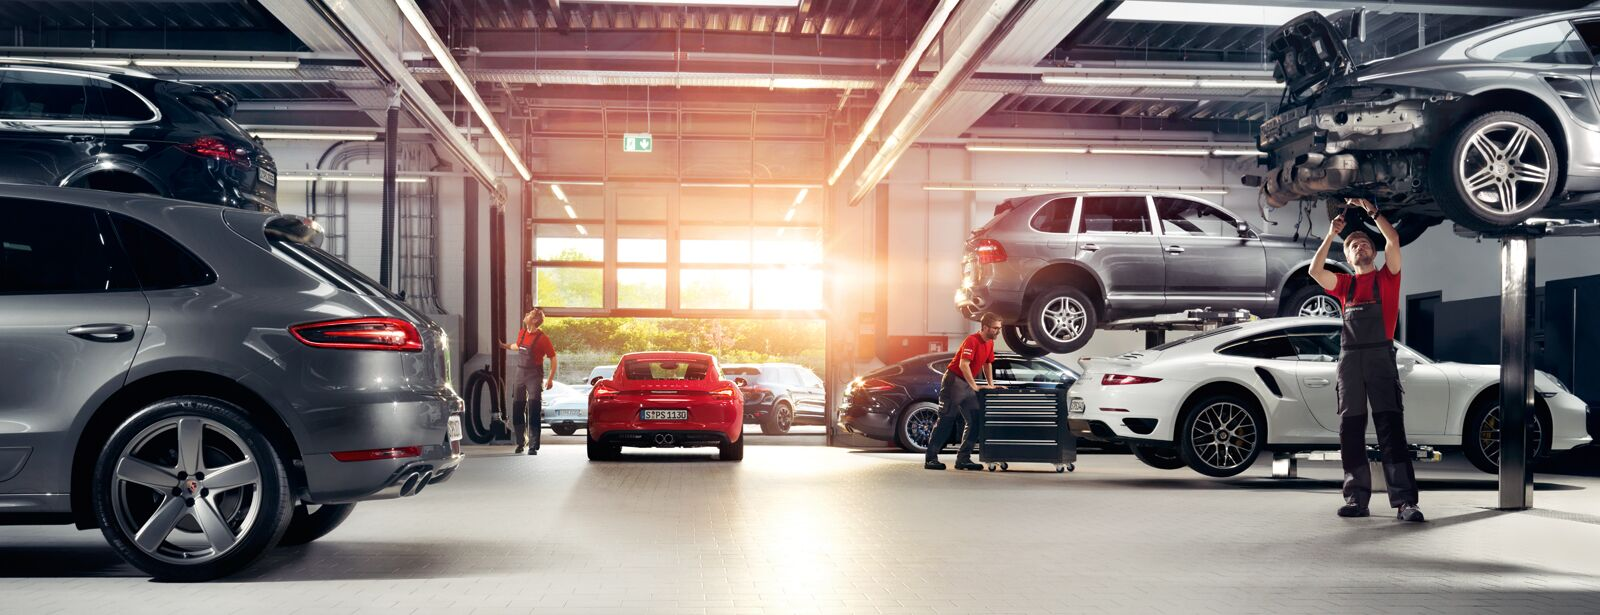 Foreign Cars Italia >> Greensboro North Carolina Aston Martin, Ferrari, Maserati, Porsche Dealership | Foreign Cars Italia